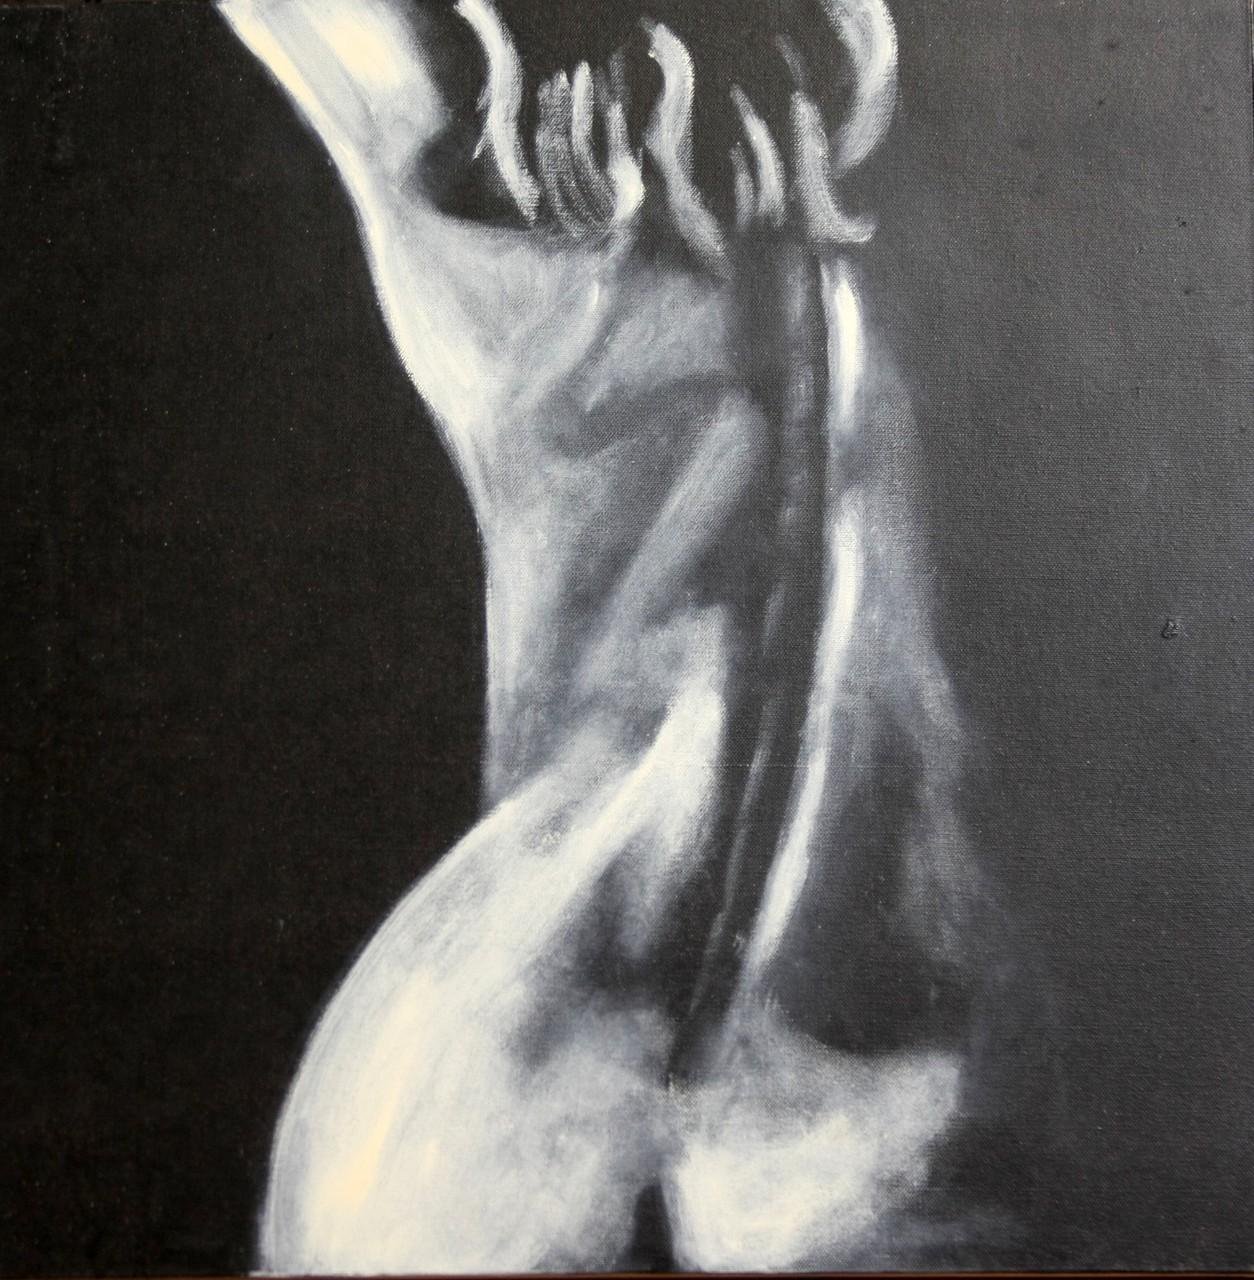 Akt 2 schwarz-weiß 60 x 60 cm